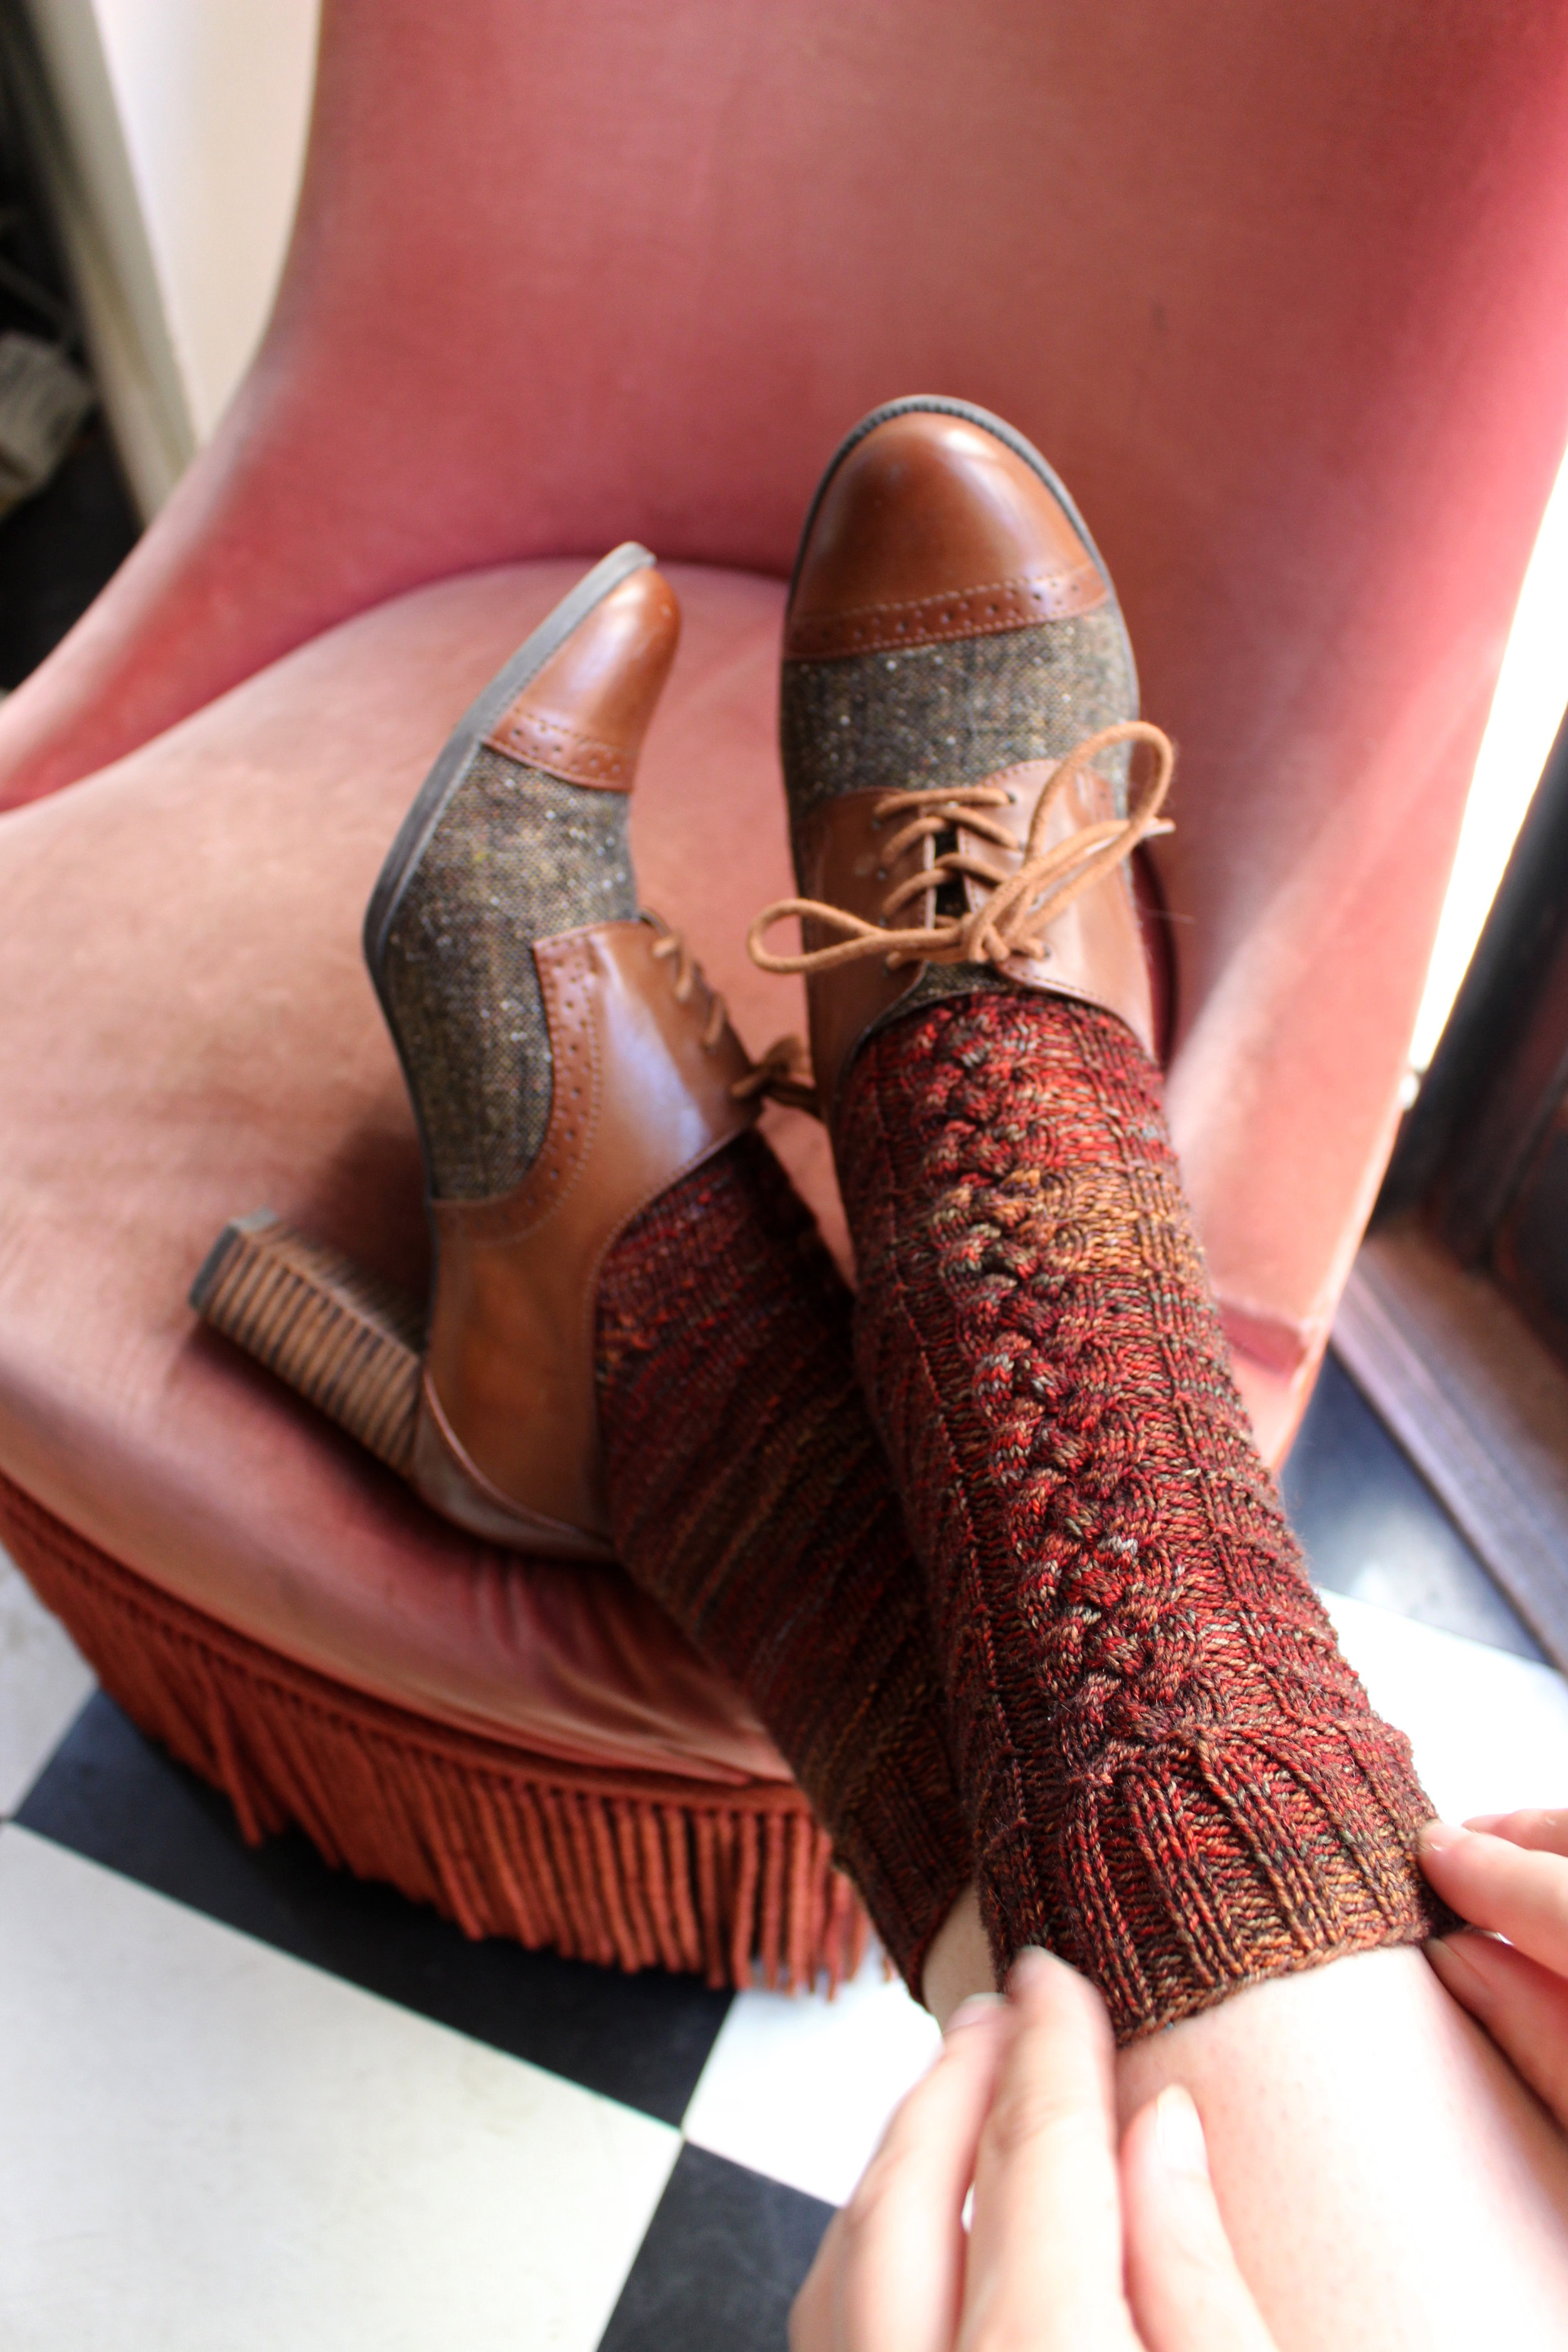 Clark socks